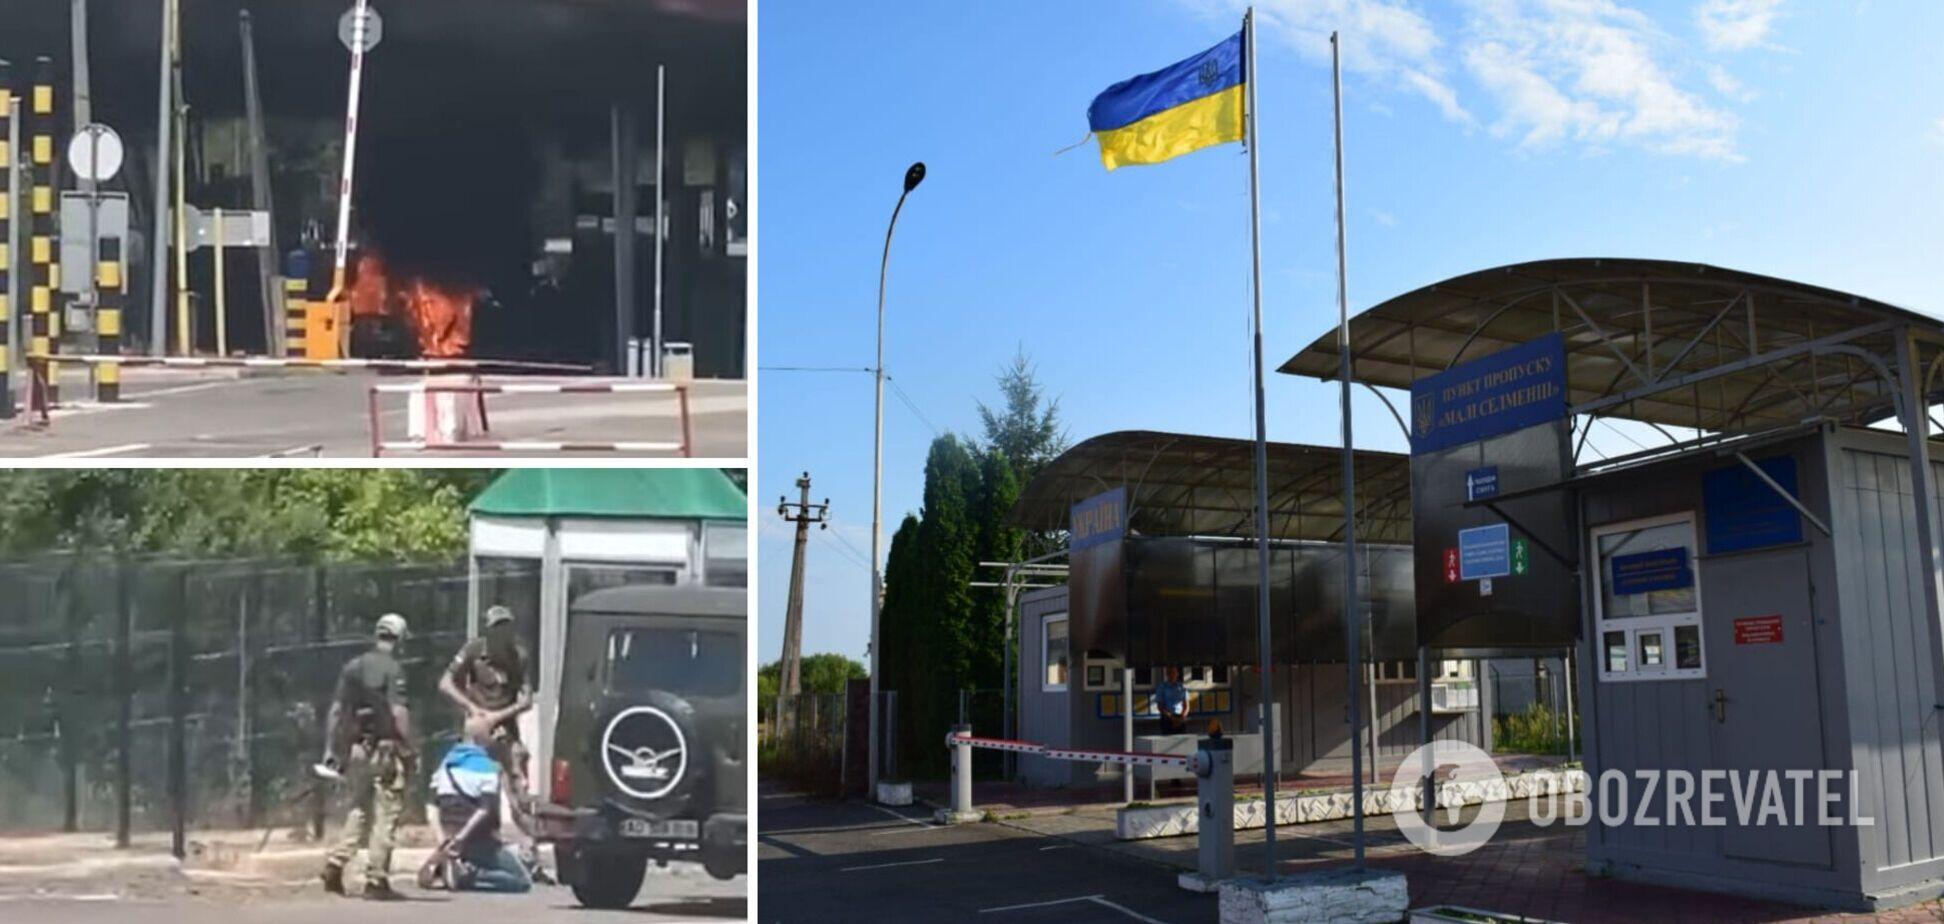 Мужчина сжег свою 'евробляху' в знак протеста против правил на украинской границе. Фото и видео